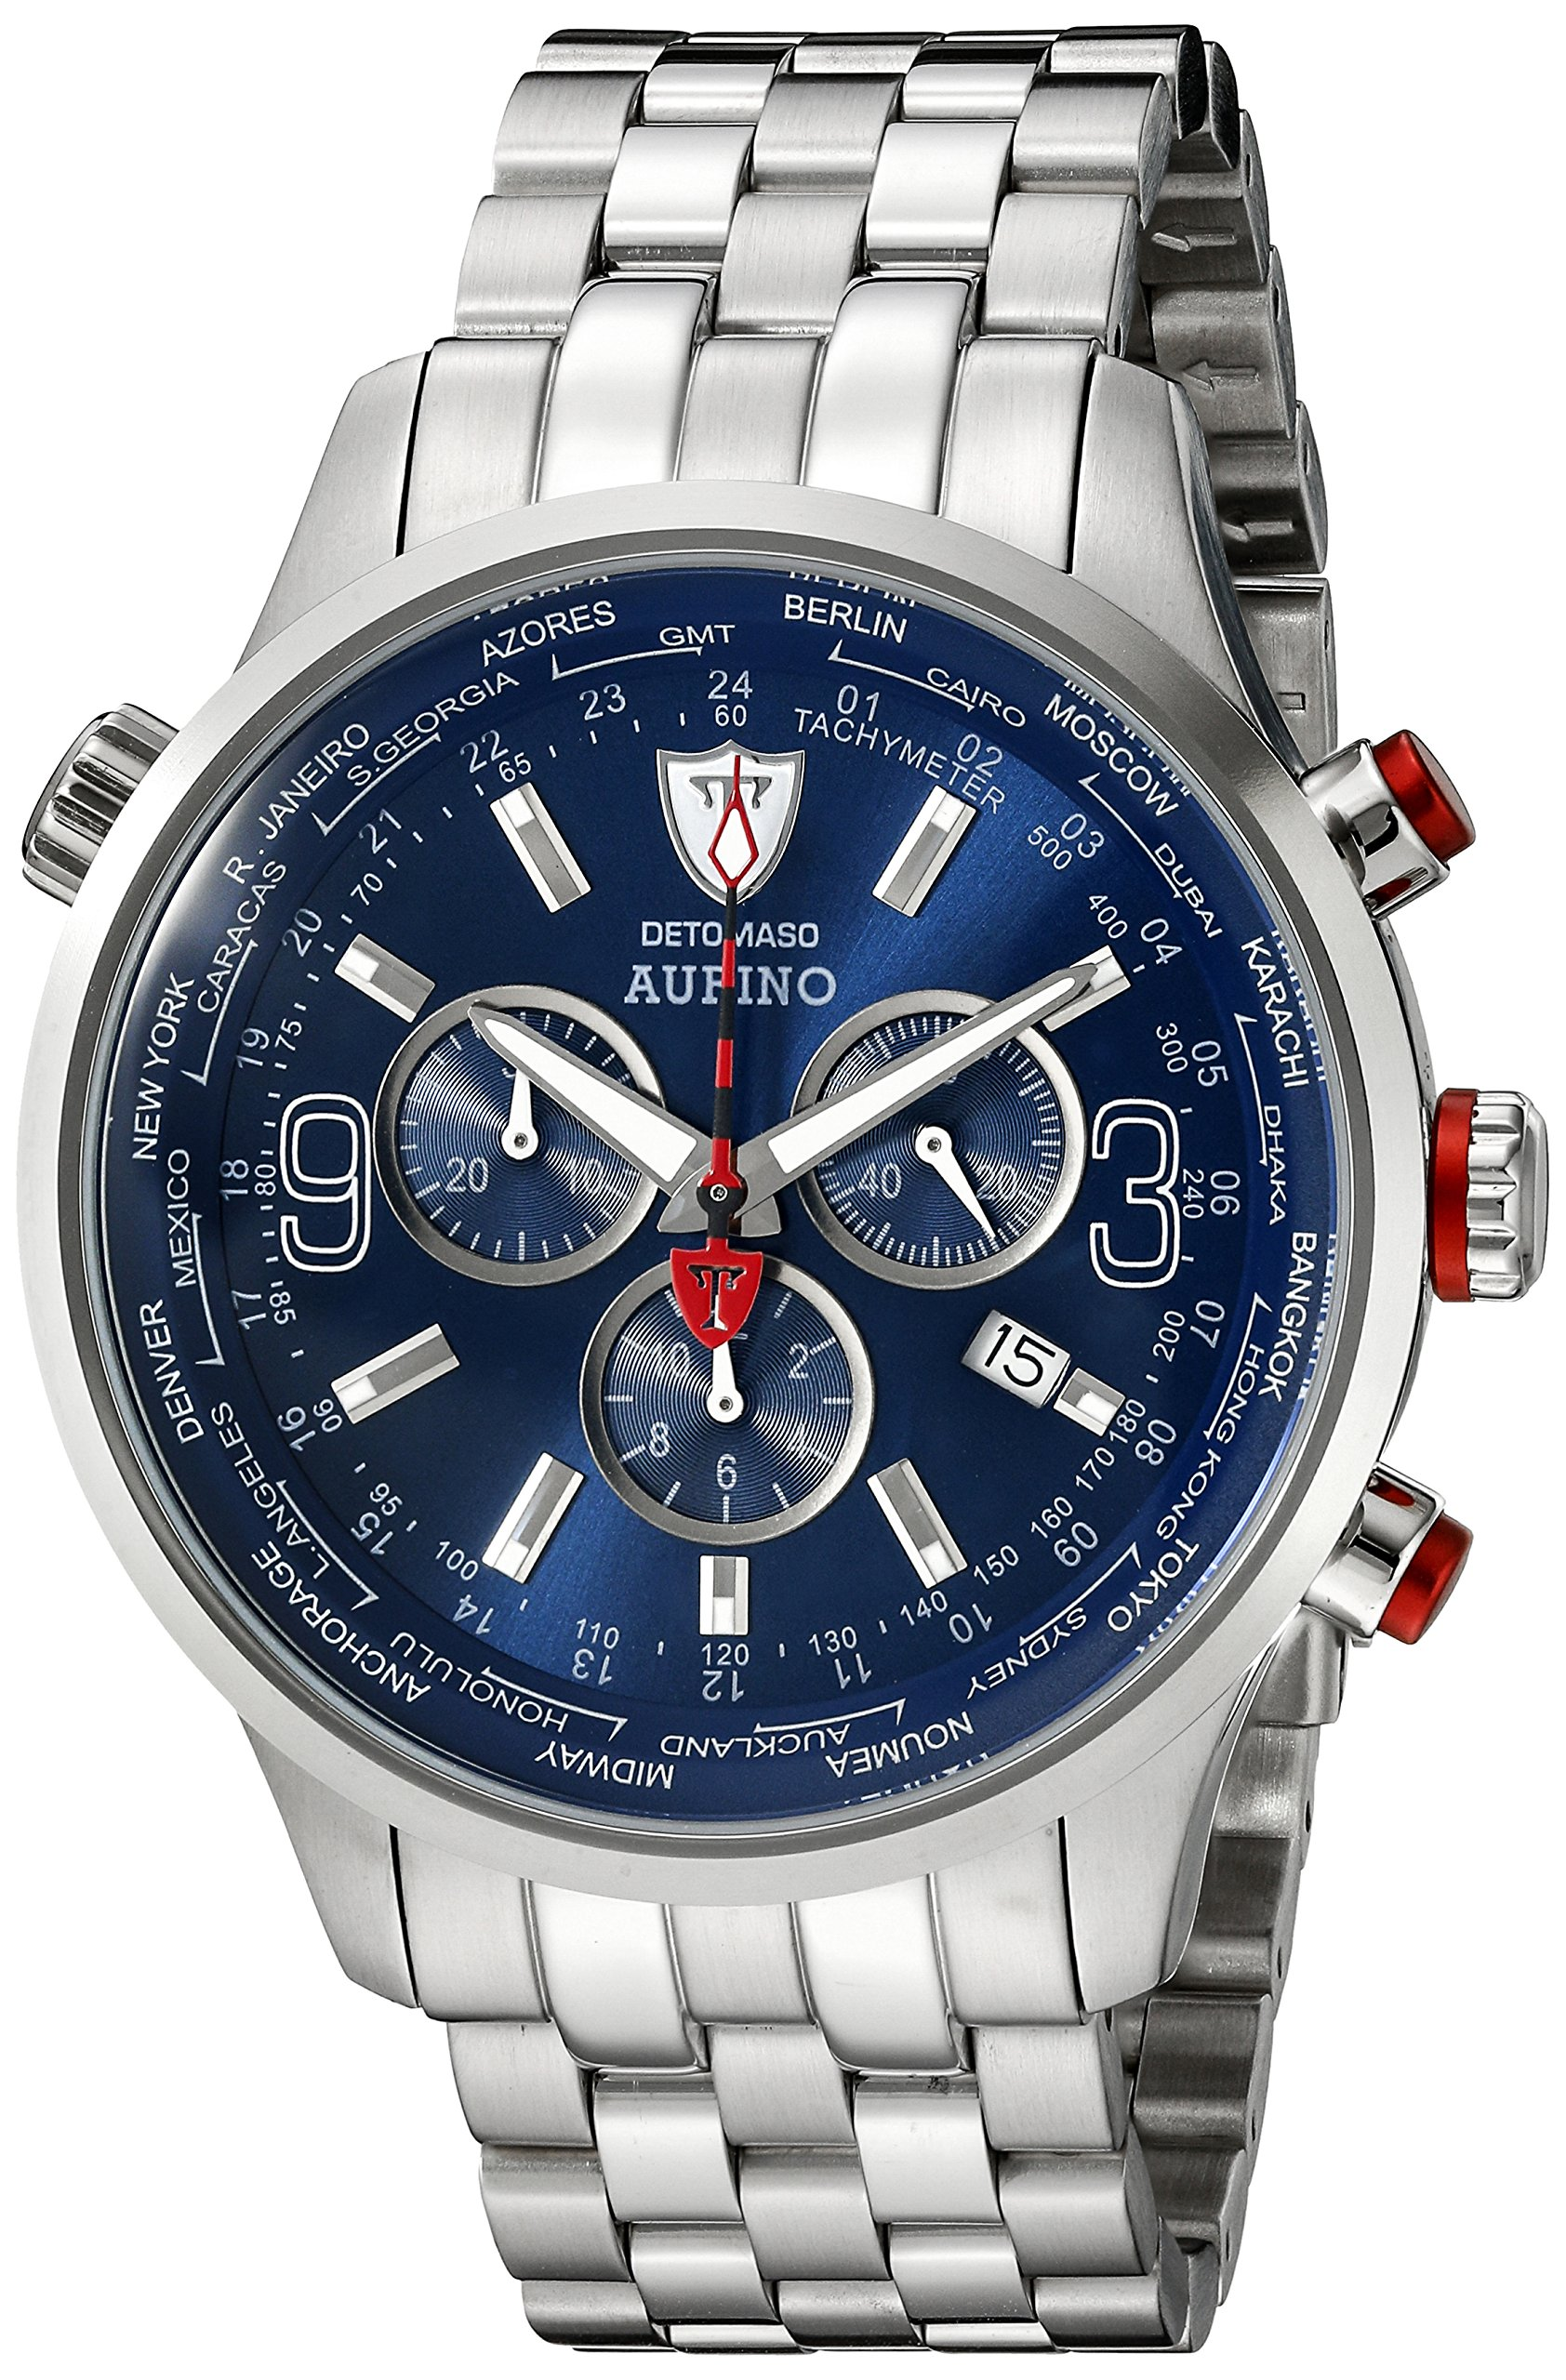 DETOMASO Men's DT1061-C AURINO XXL Chronograph Trend blau/silber Analog Display Swiss Quartz Silver Watch